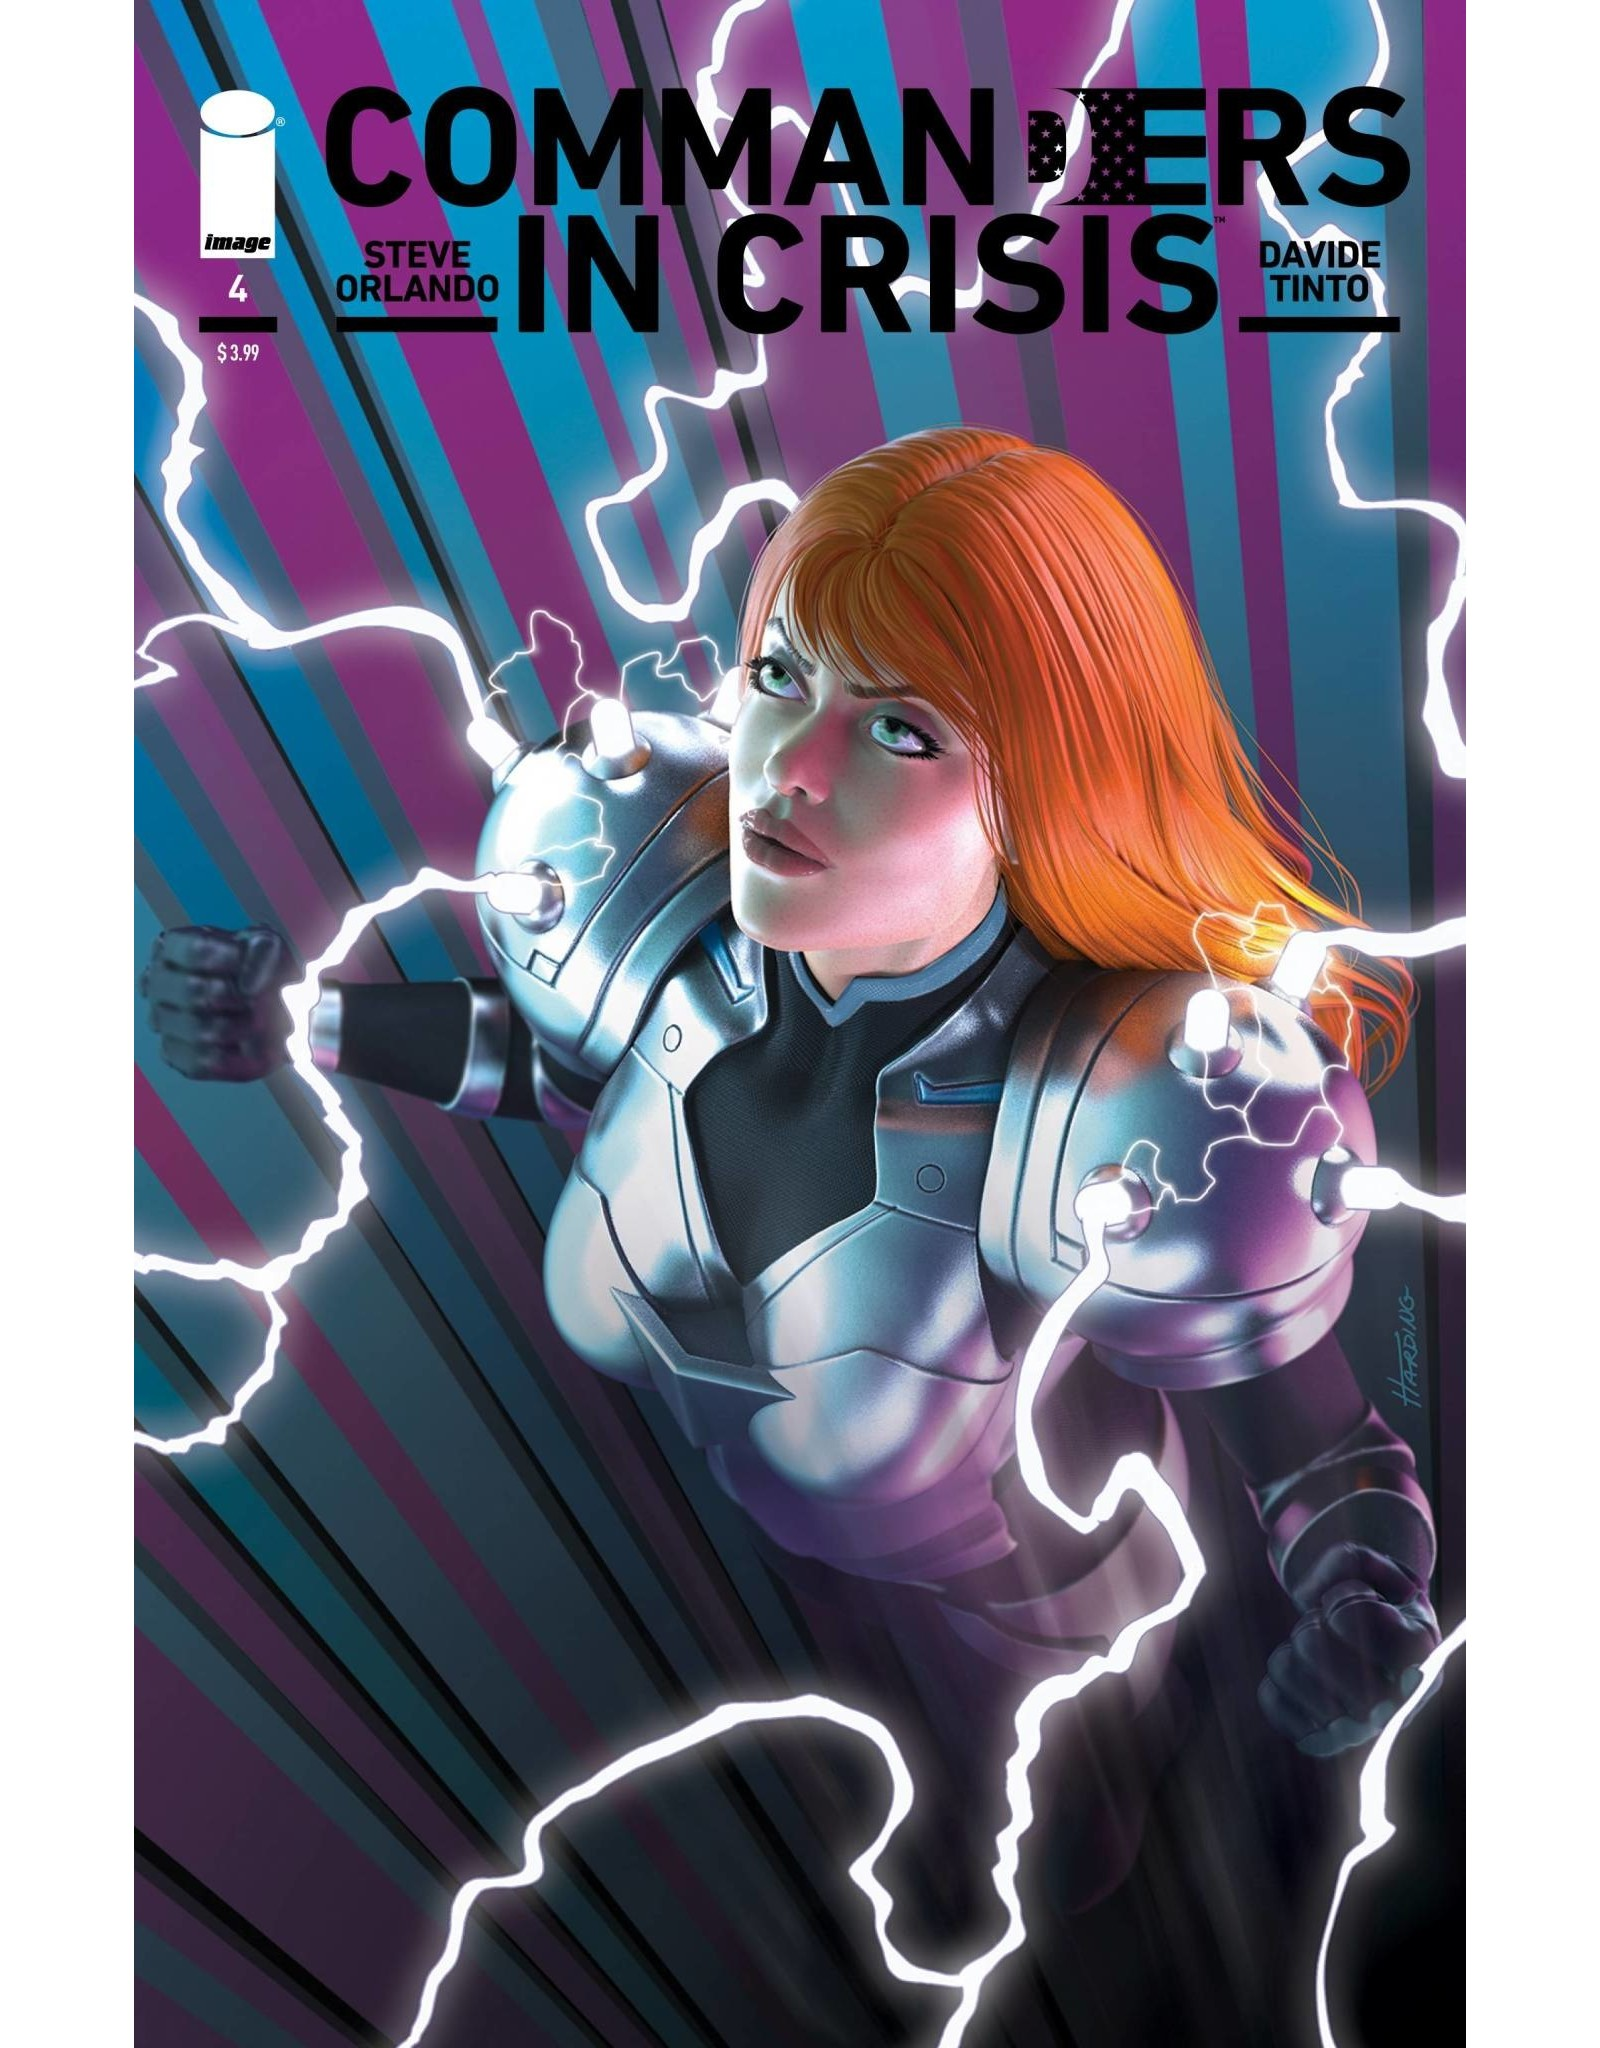 Image Comics COMMANDERS IN CRISIS #4 (OF 12) 1:10 HARDING